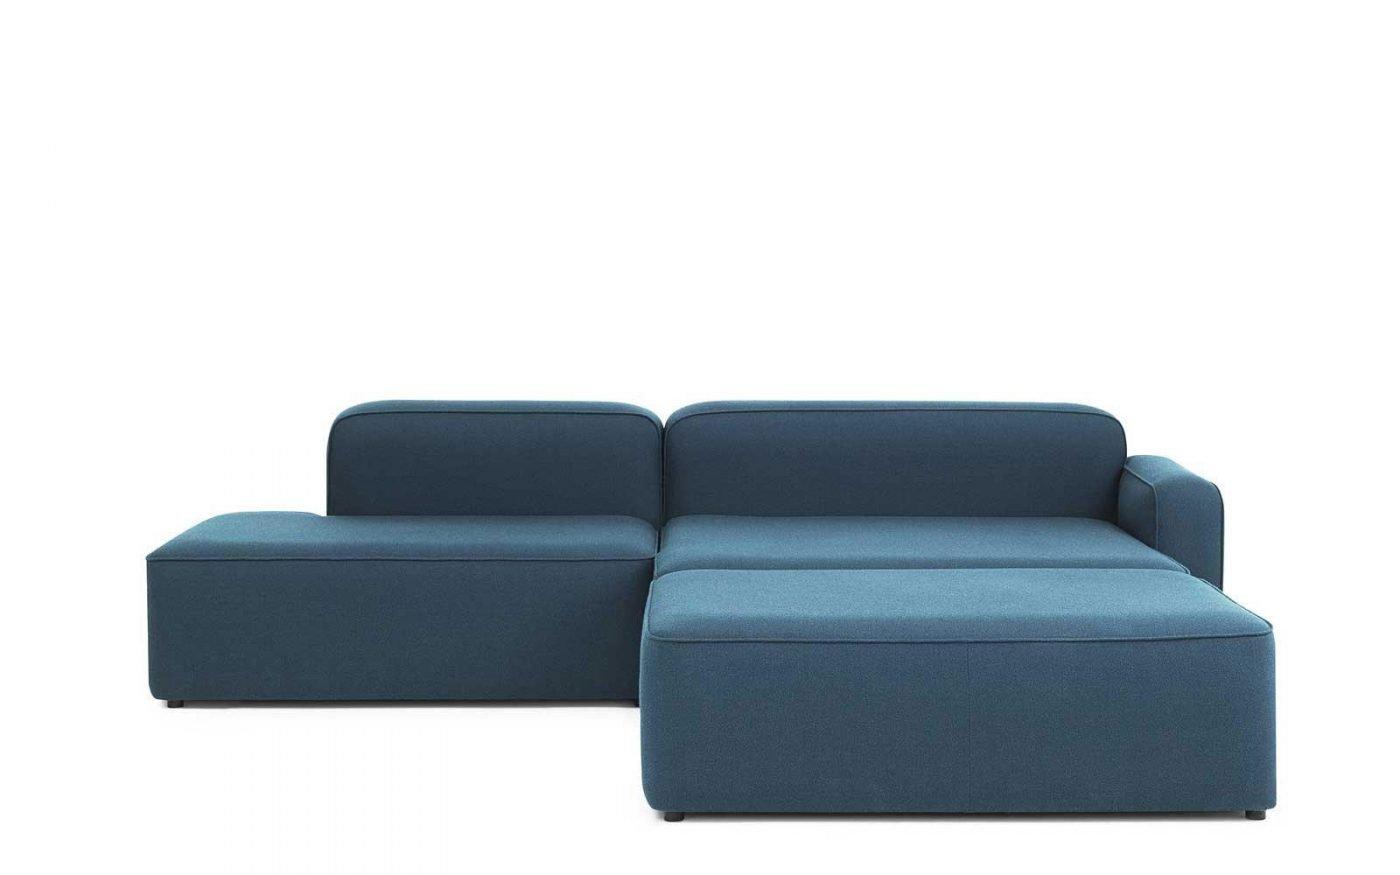 Rope-Sofa-chaise-Right+pouf Normann copenhagen